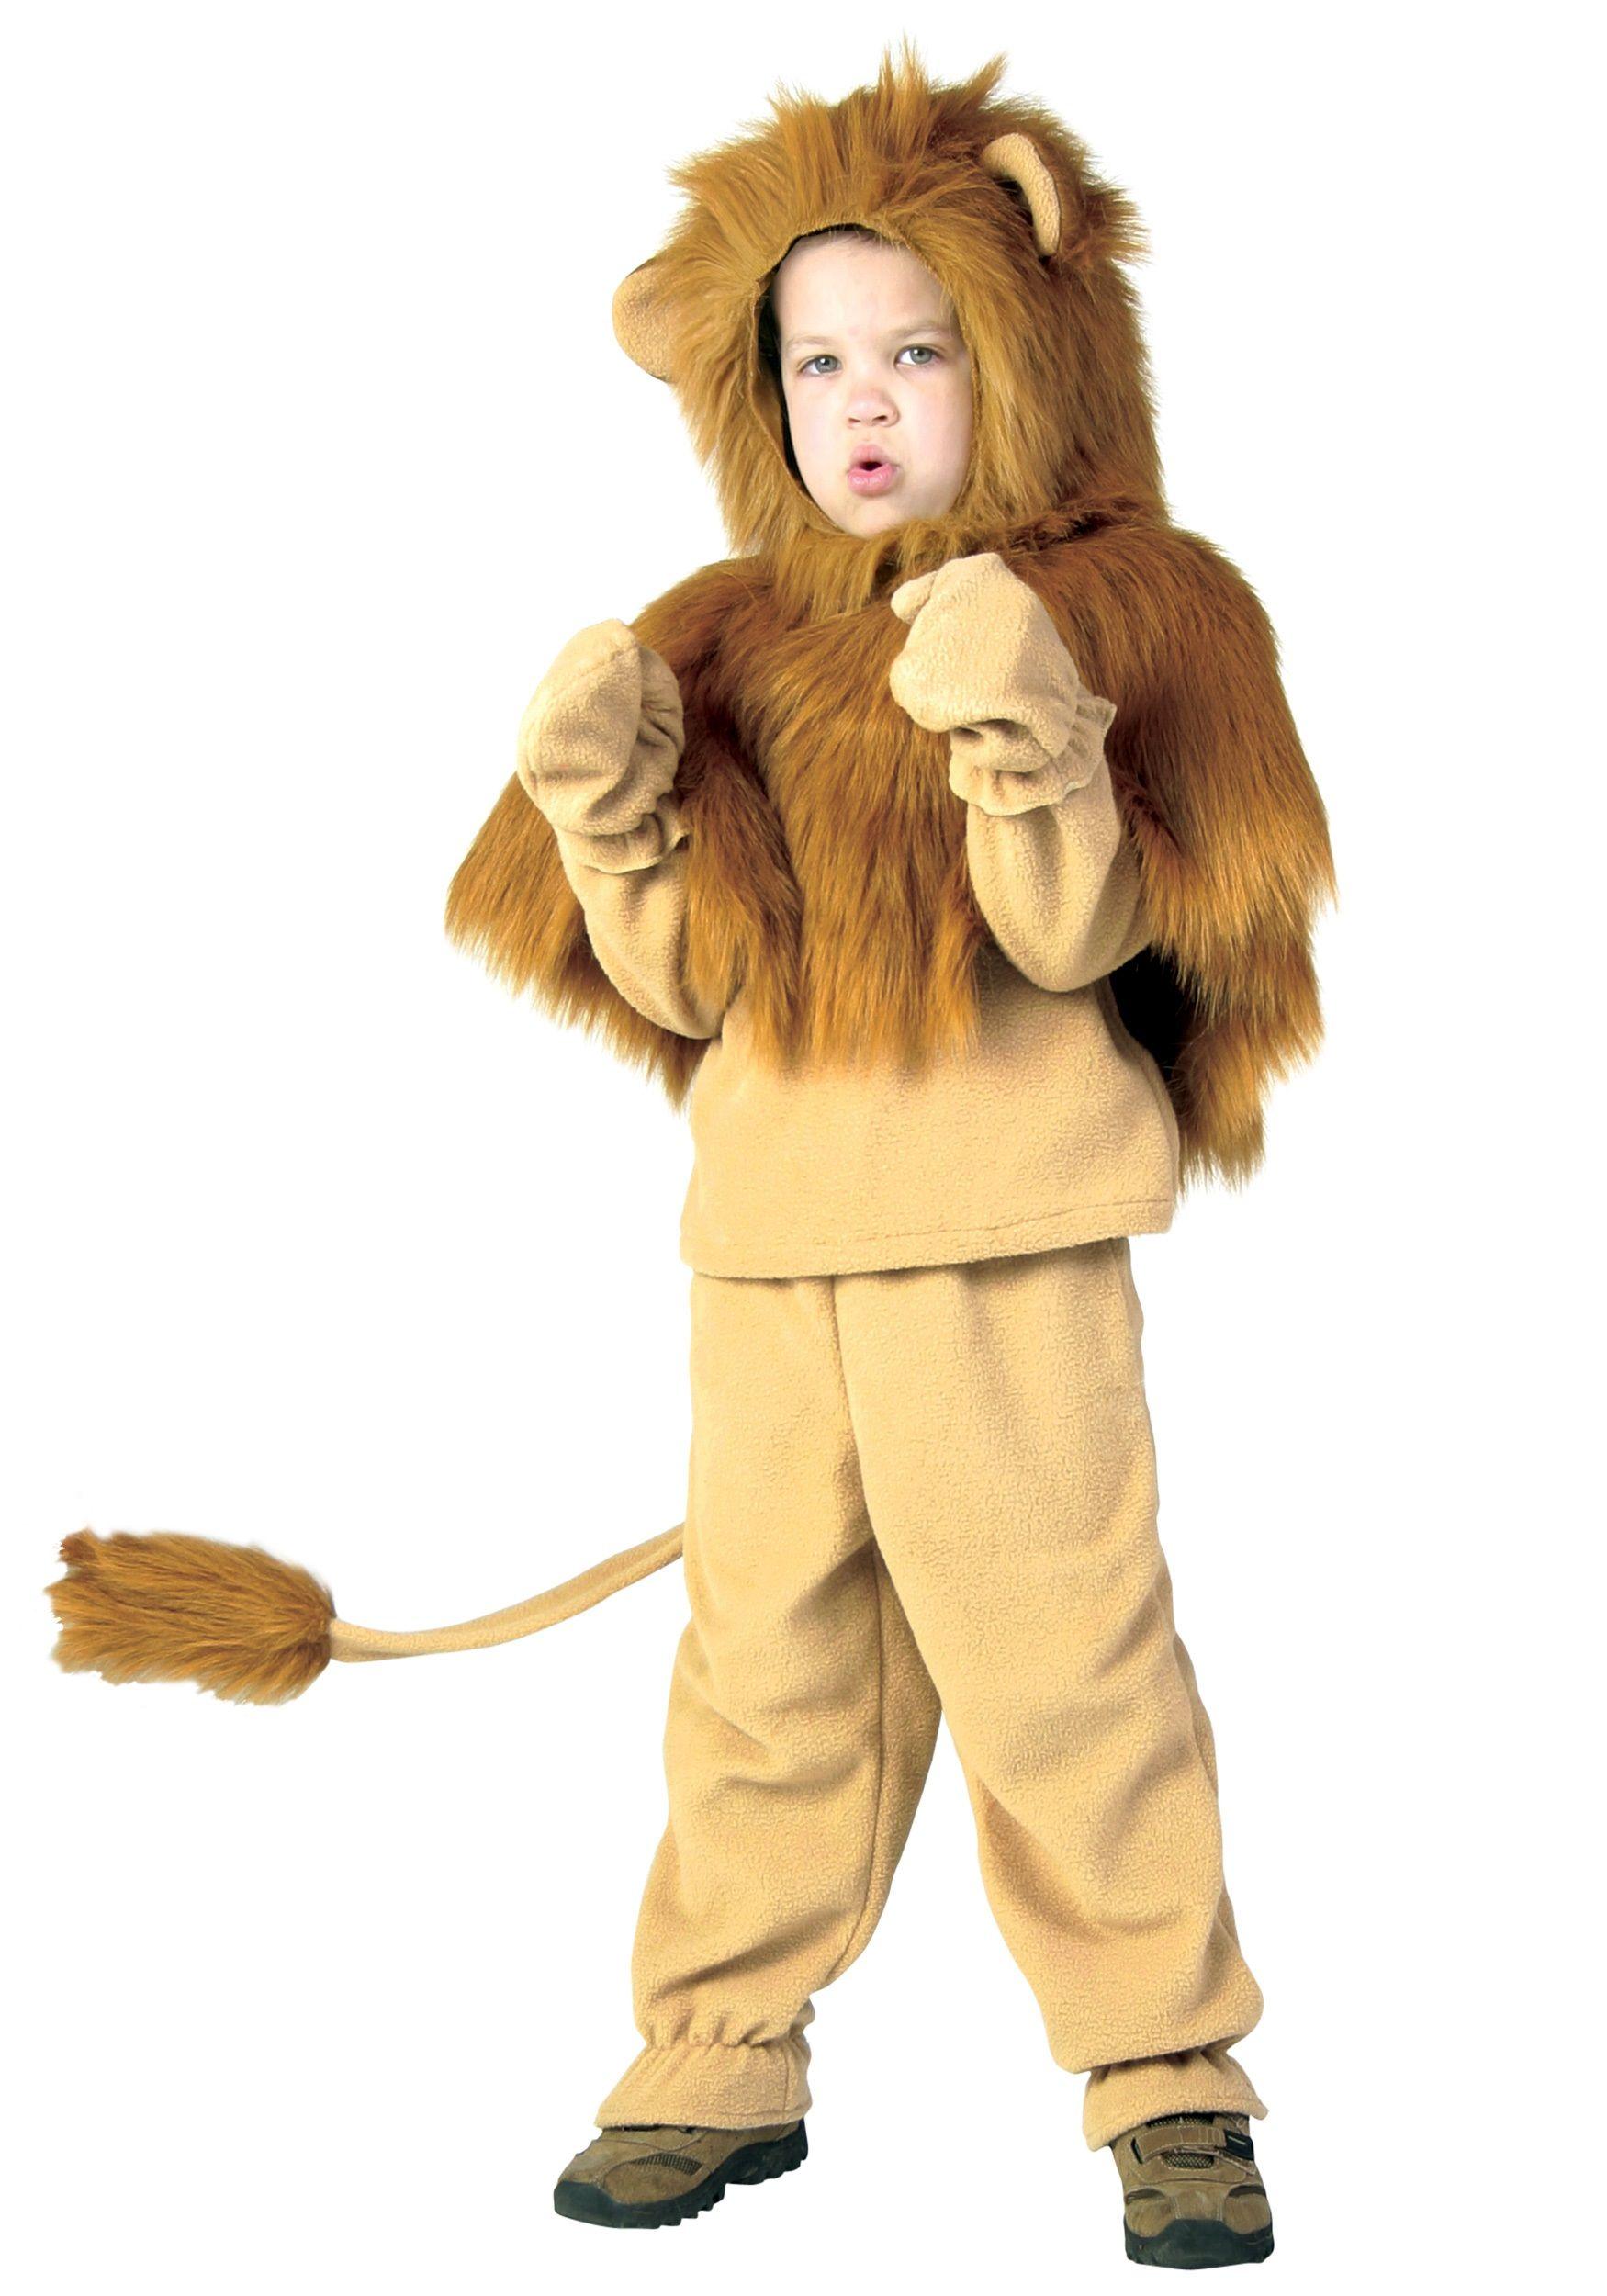 Cowardly Lion Costume Kids Wizard of Oz Halloween Fancy Dress